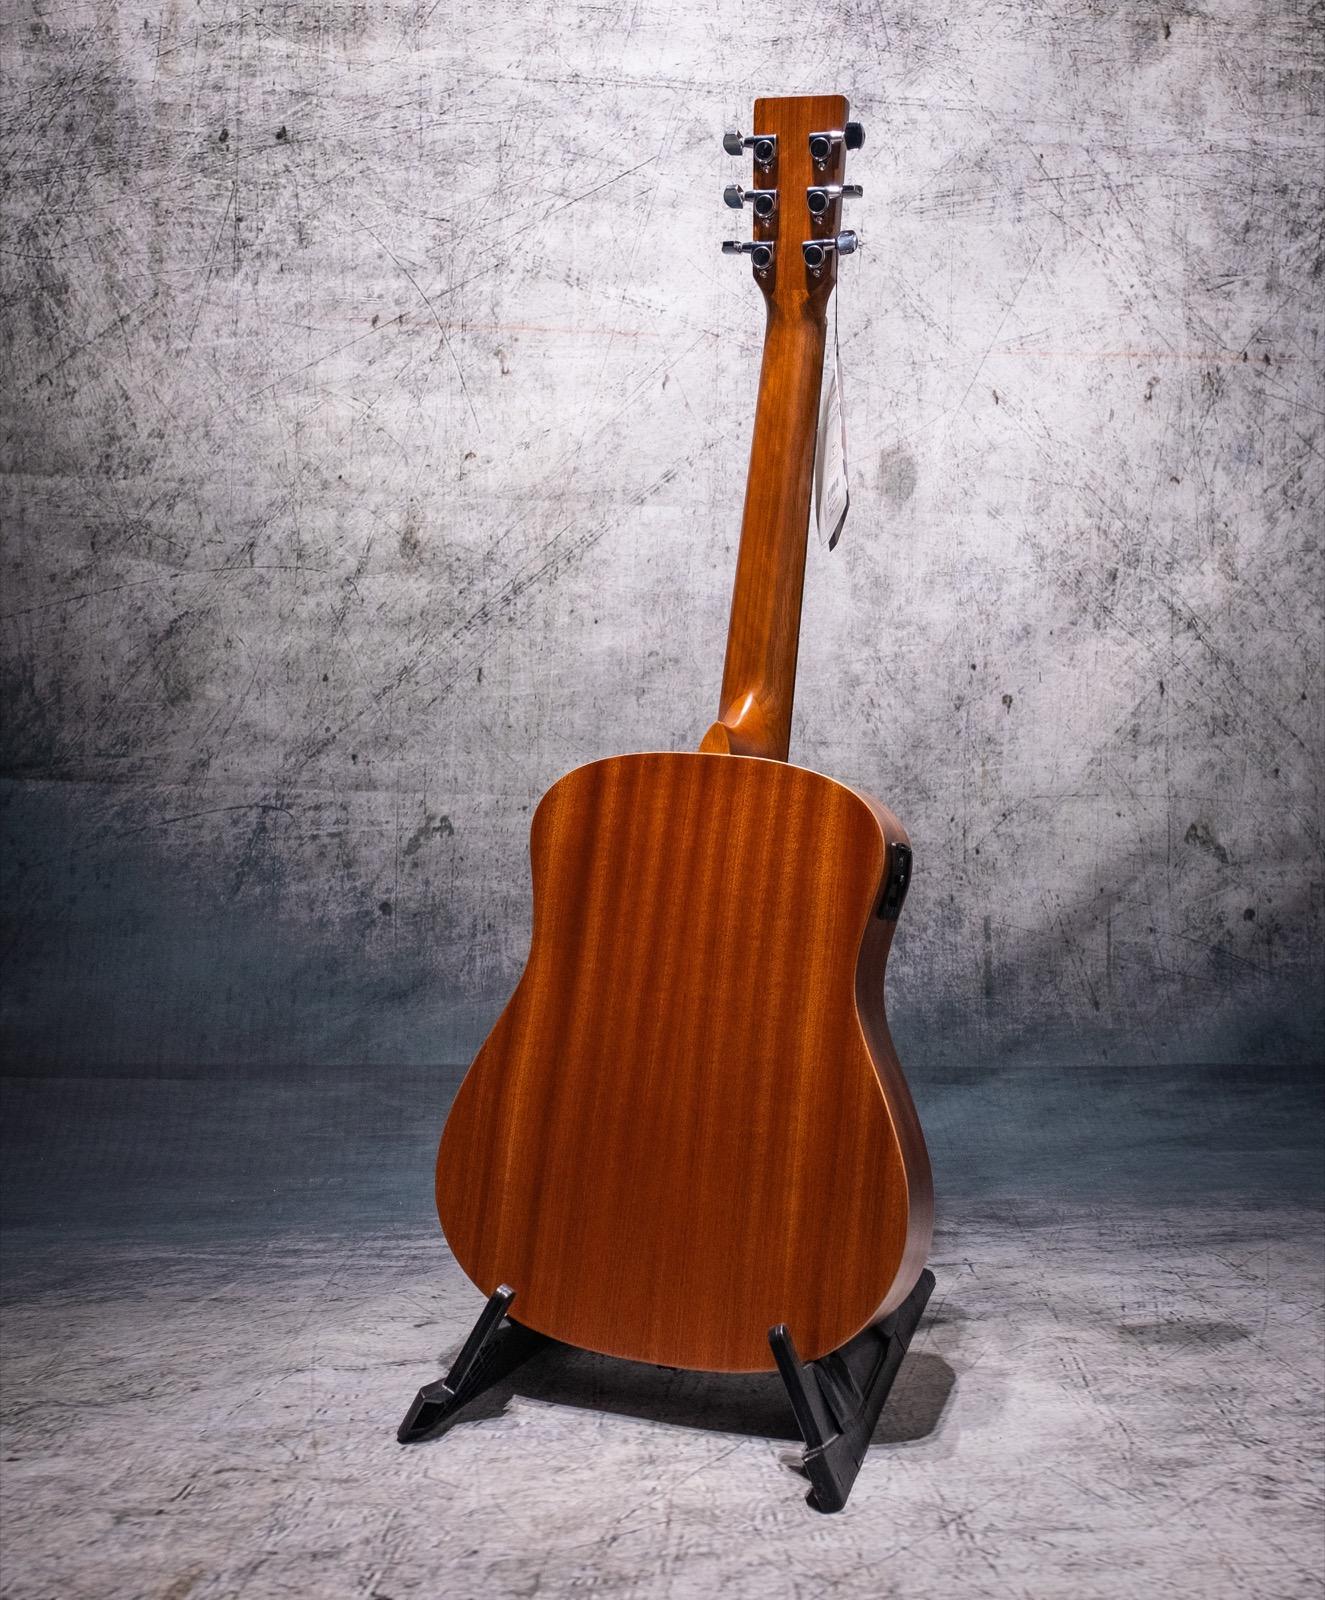 tanglewood electro acoustic travel guitar tw2 t se guitarshop folkestone. Black Bedroom Furniture Sets. Home Design Ideas